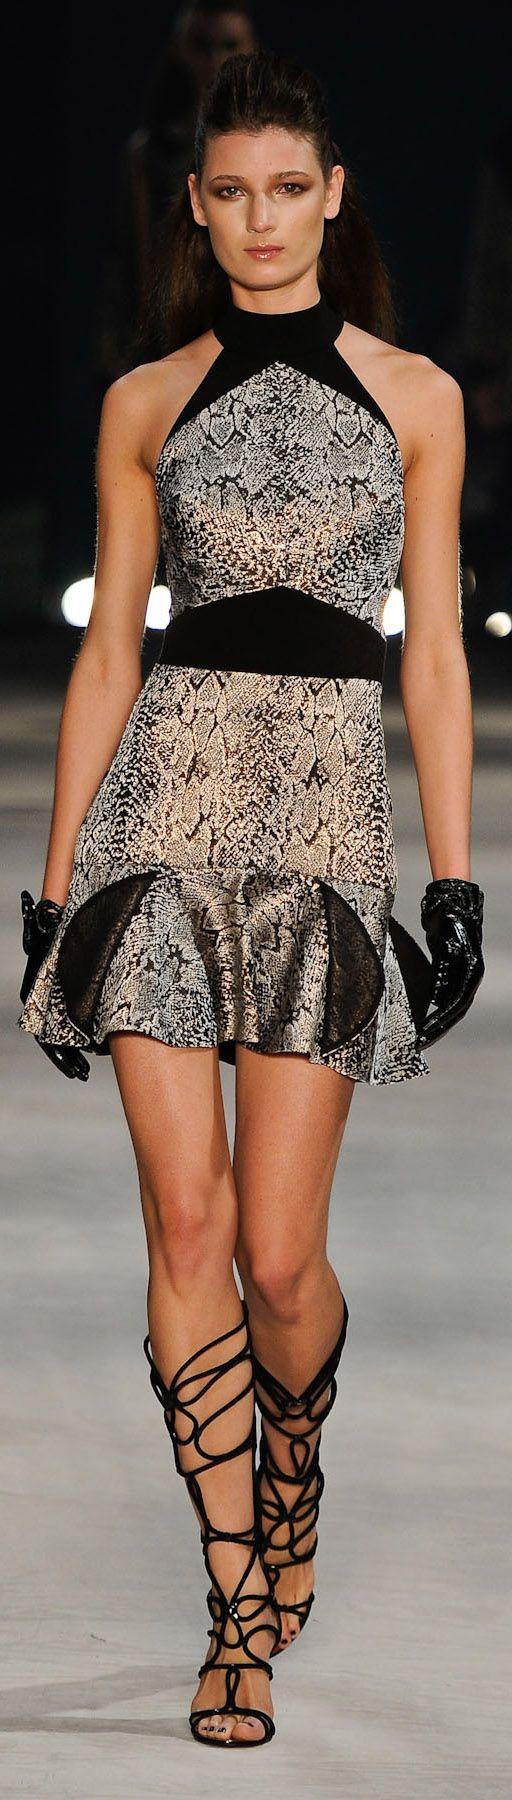 ✪ Iodice ✪ (São Paulo Fashion Week) Brazil Fashion Week 2012 ✪ http://chicquero.com/2012/01/25/happy-birthday-sao-paulo/